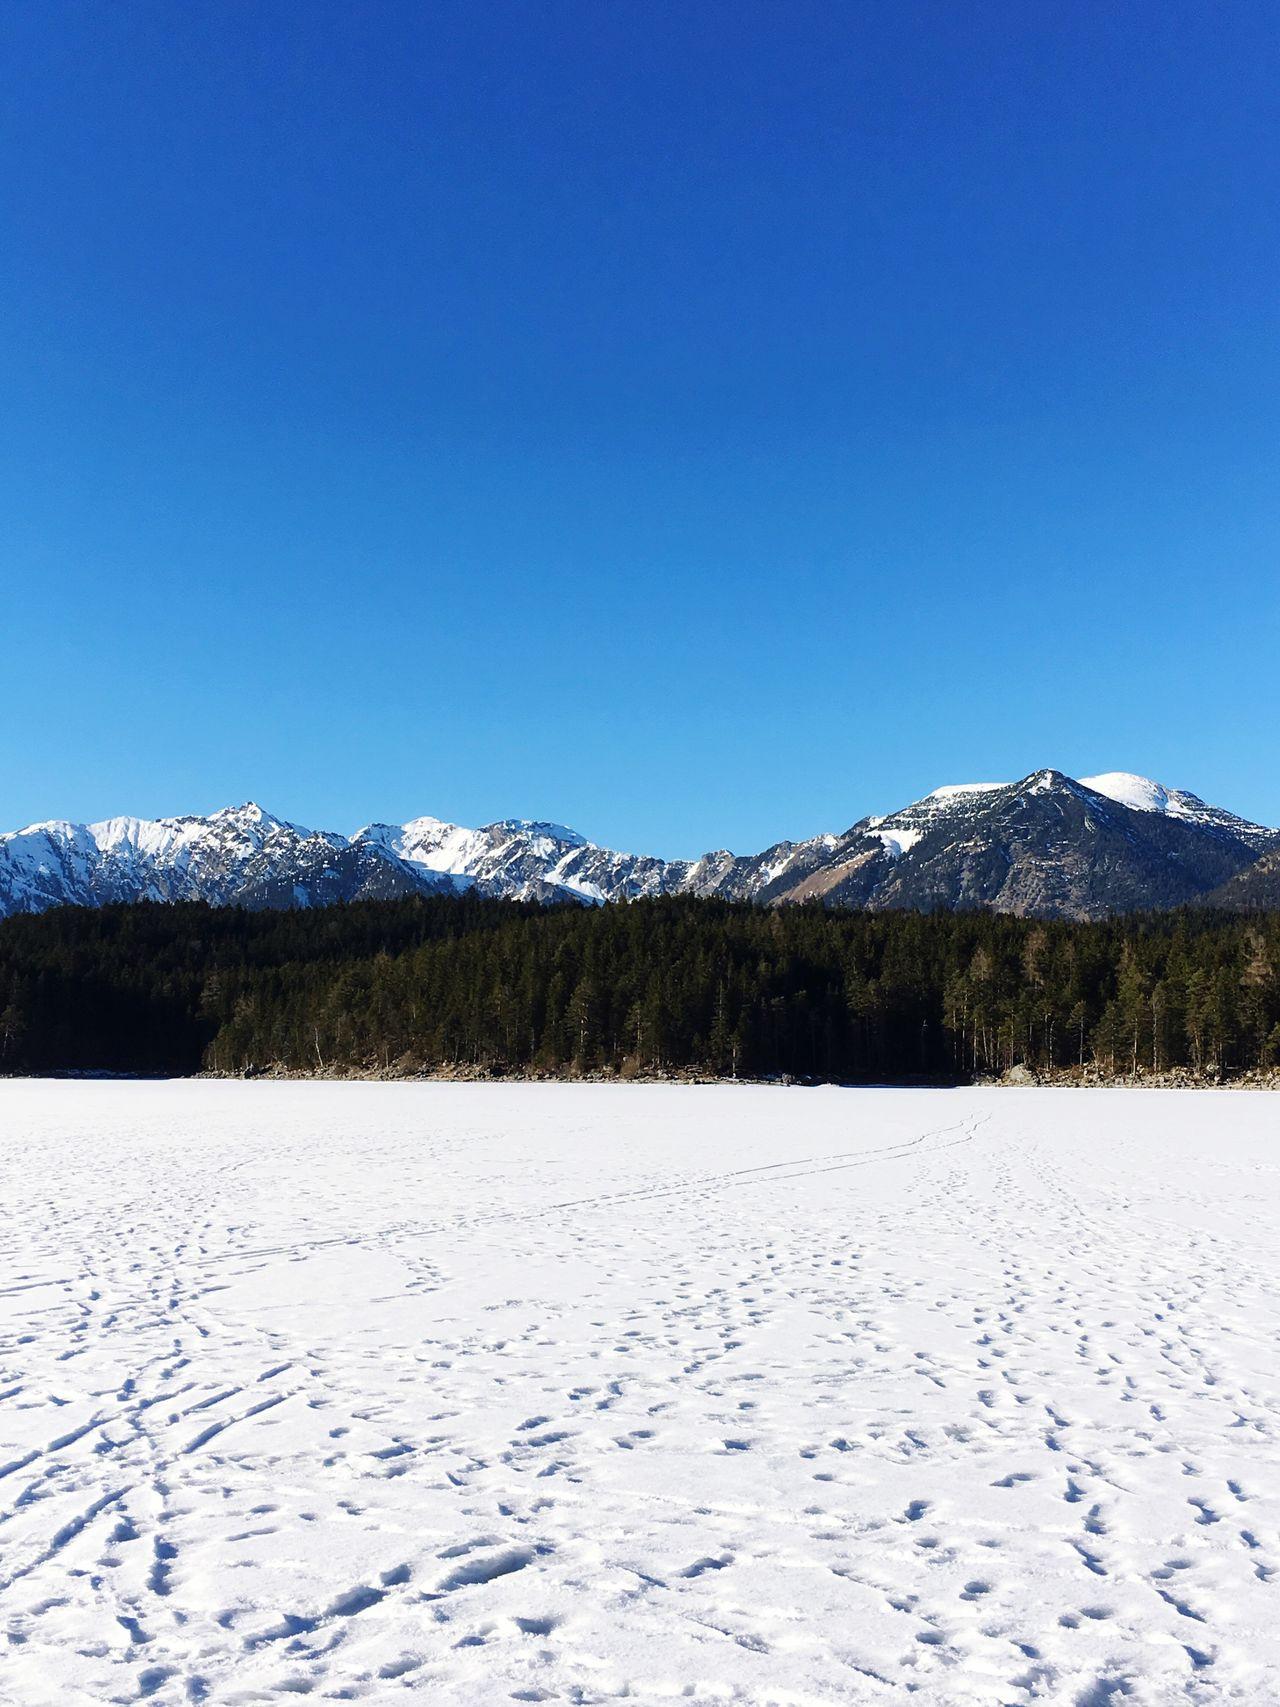 Winter Frozen Lake EyeEmNewHere